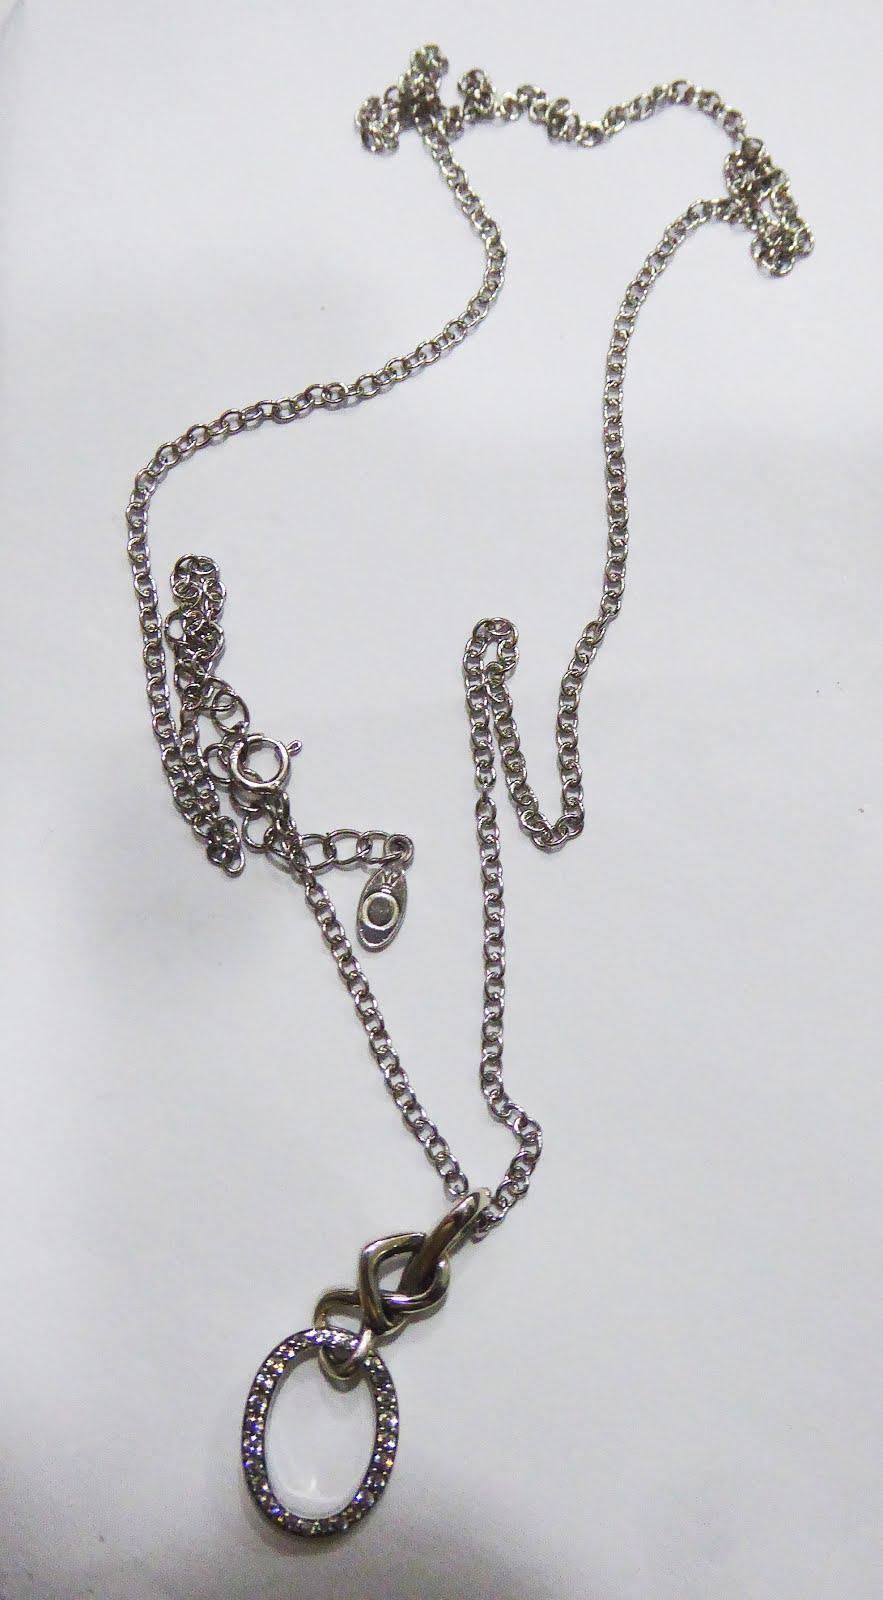 Gargantilla de plata con circonitas